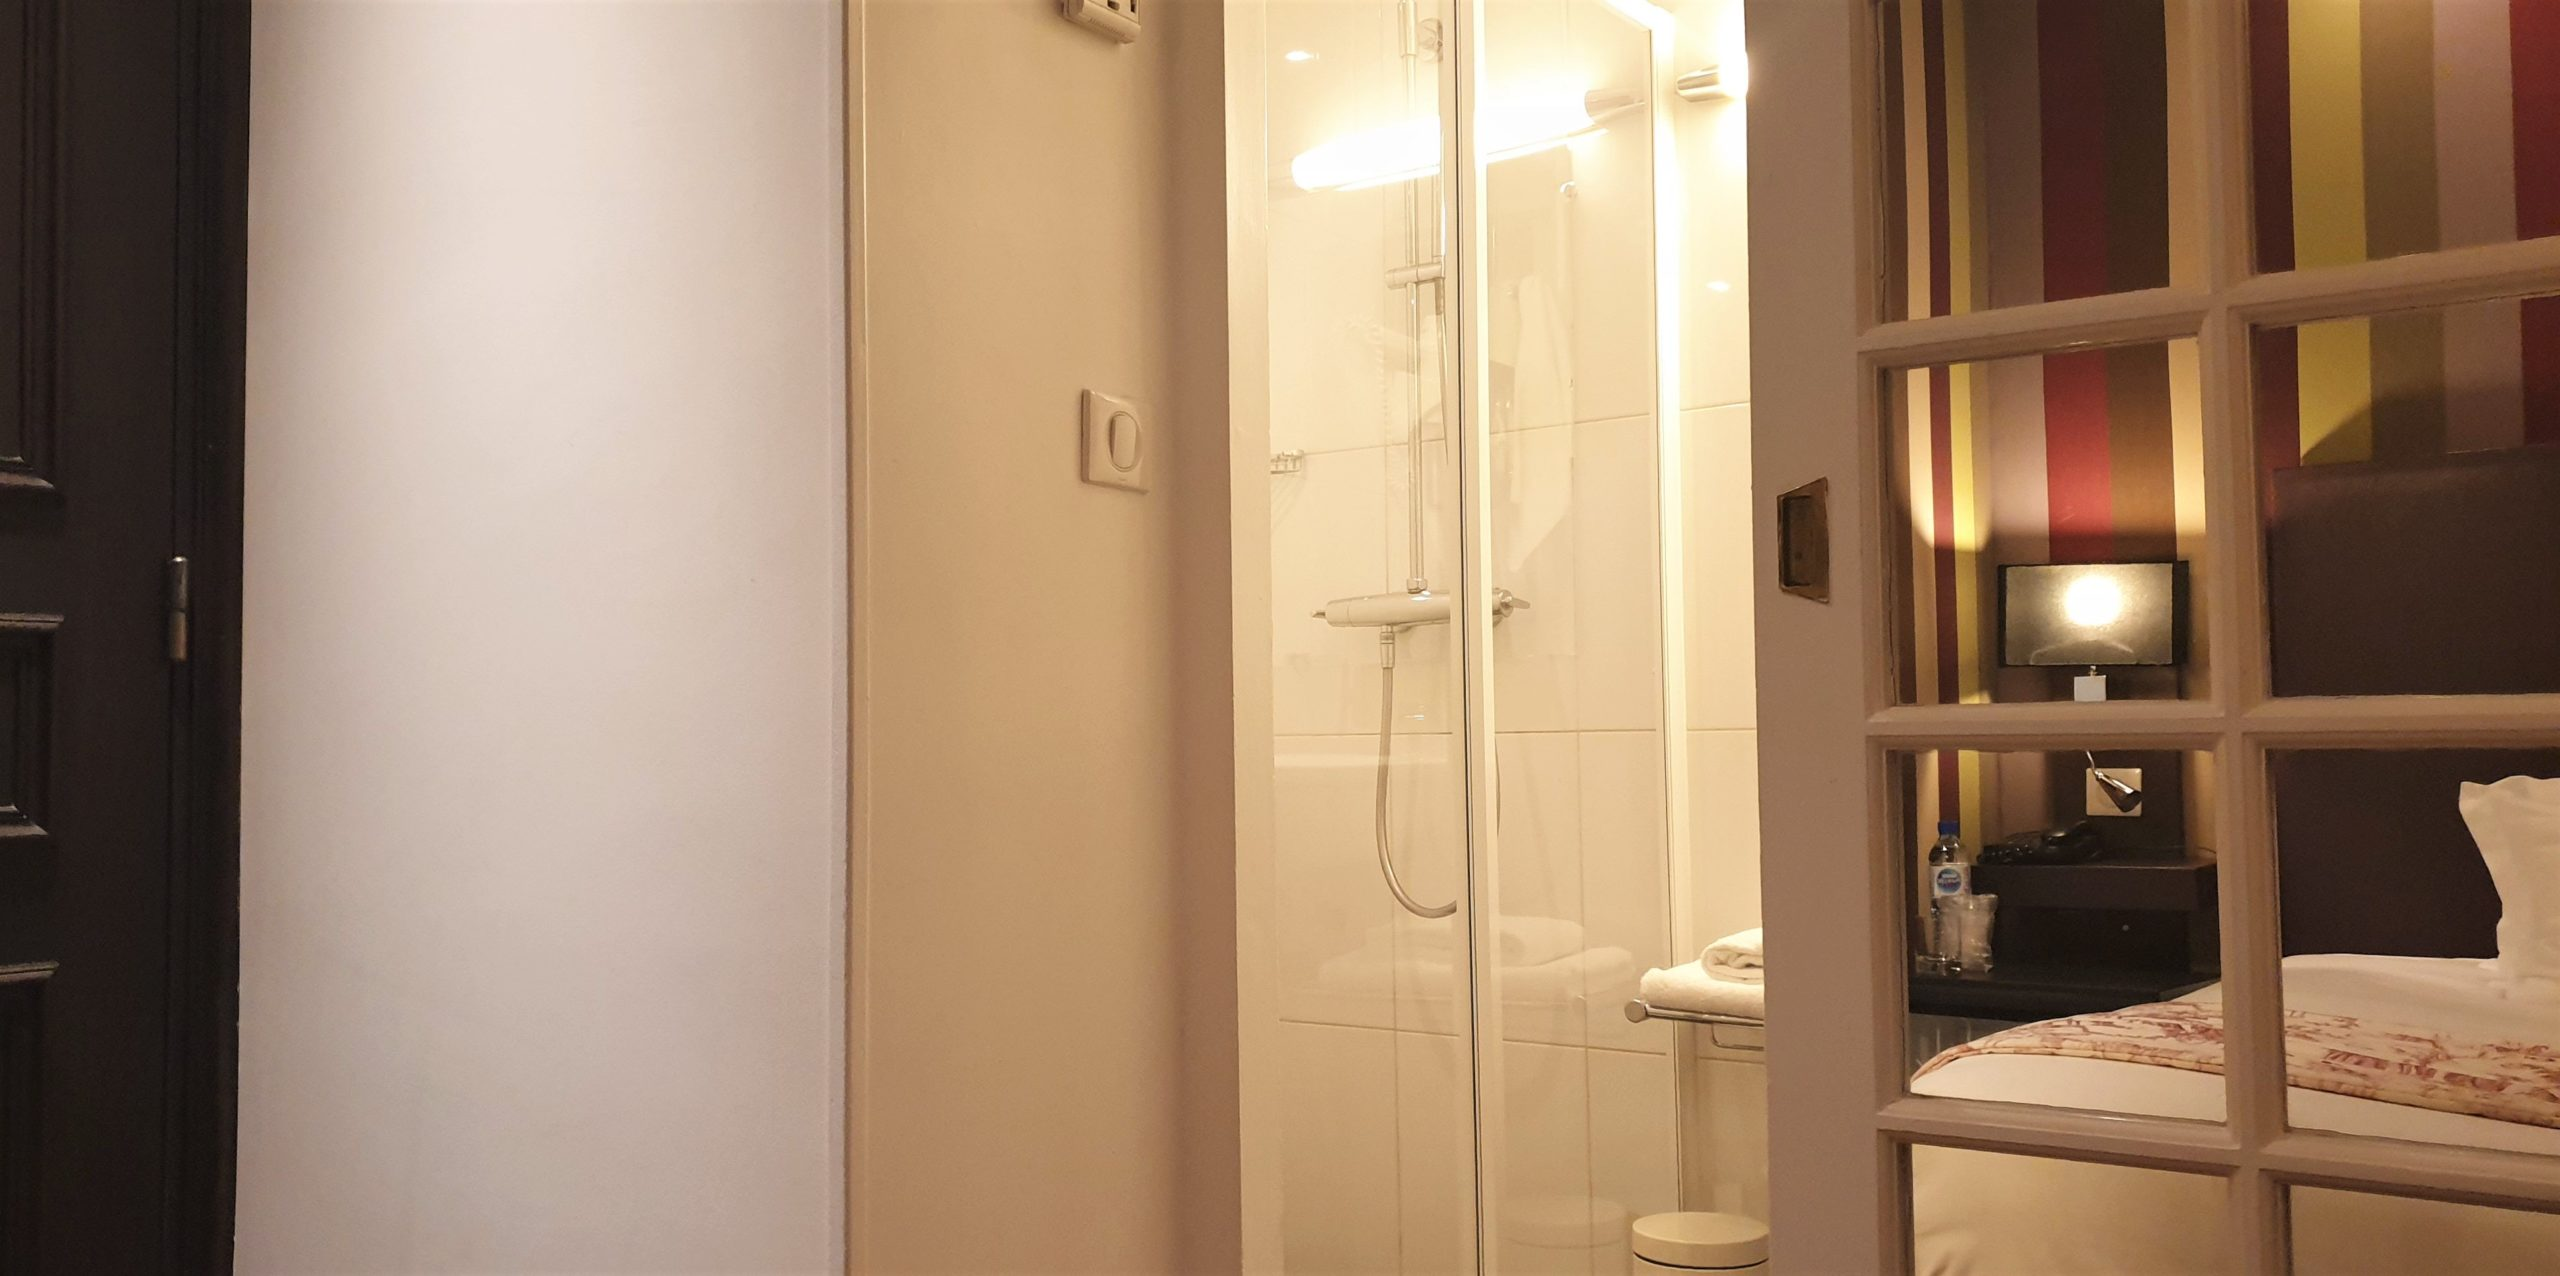 single bathroom view - Champs-Élysées star hotel